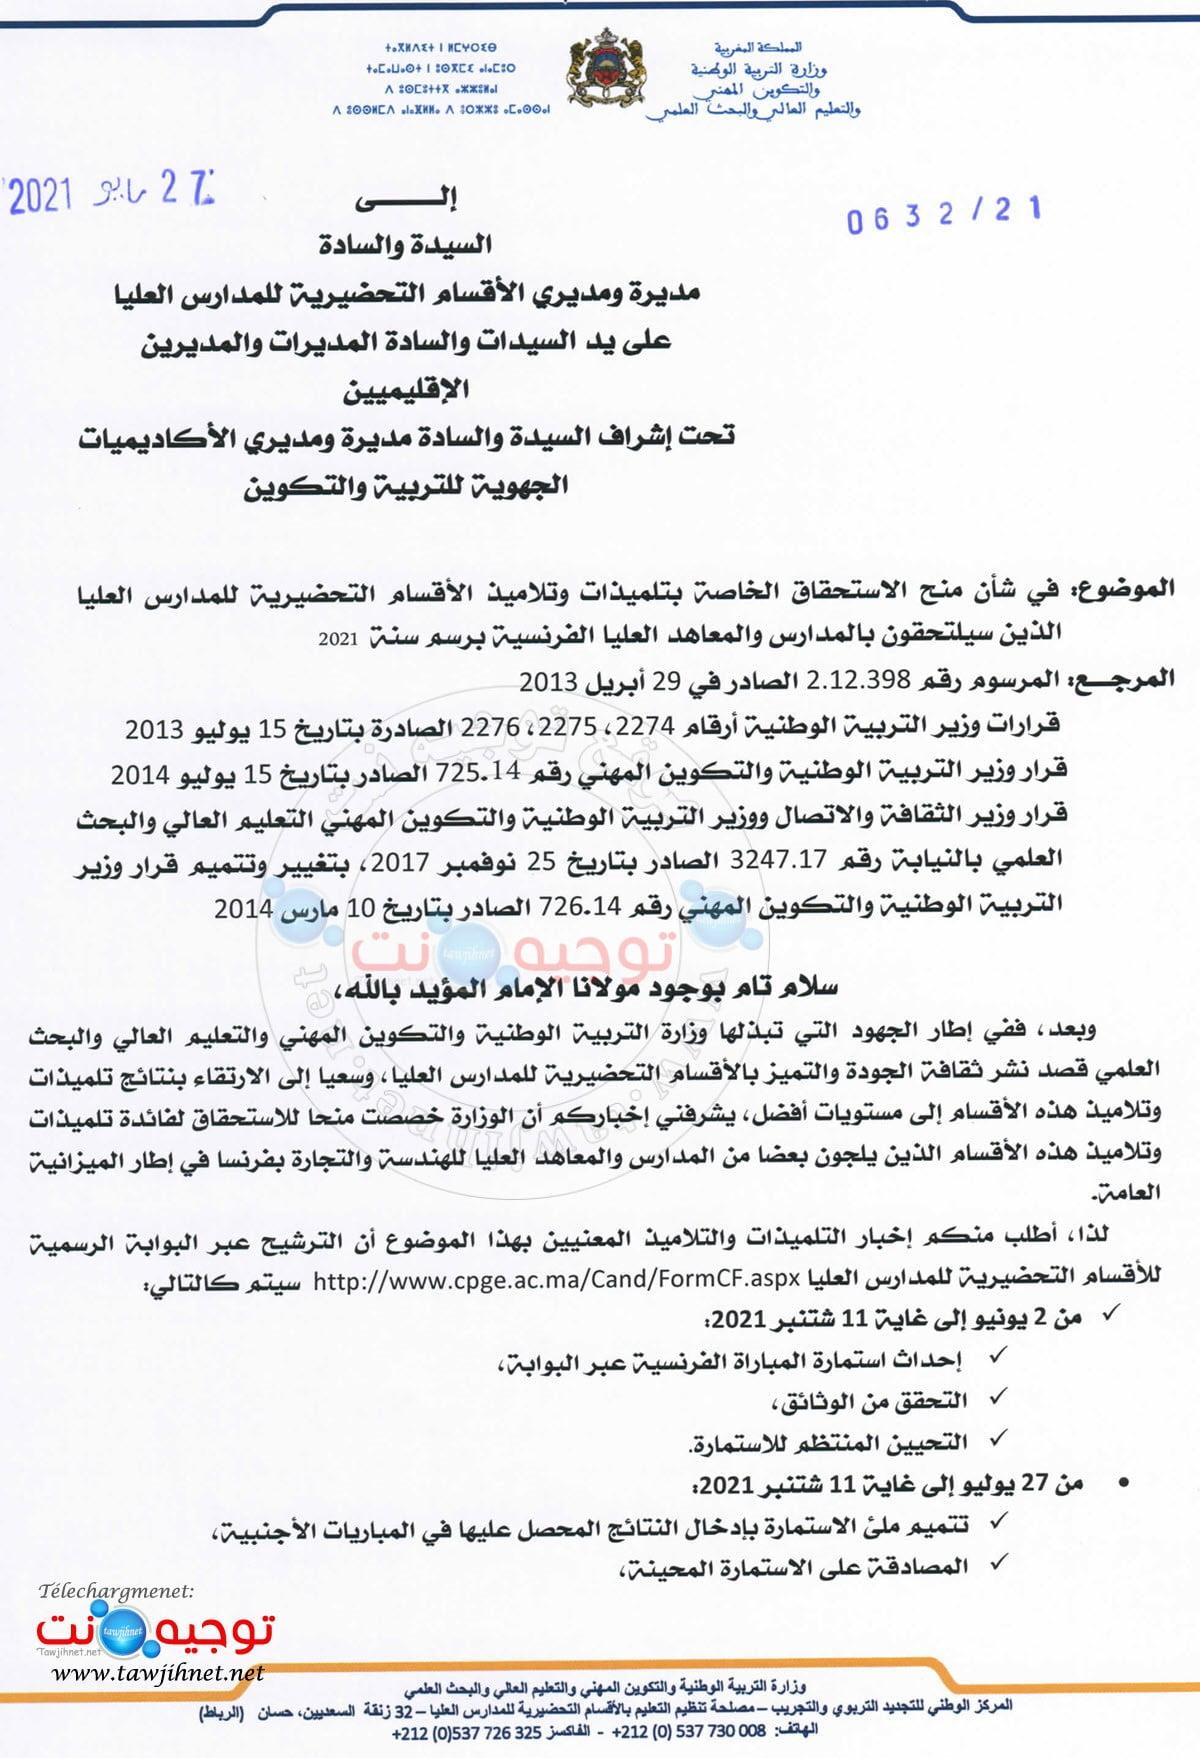 CPGE Merit scholarships OCP France Morocco Foundation 2021 2022